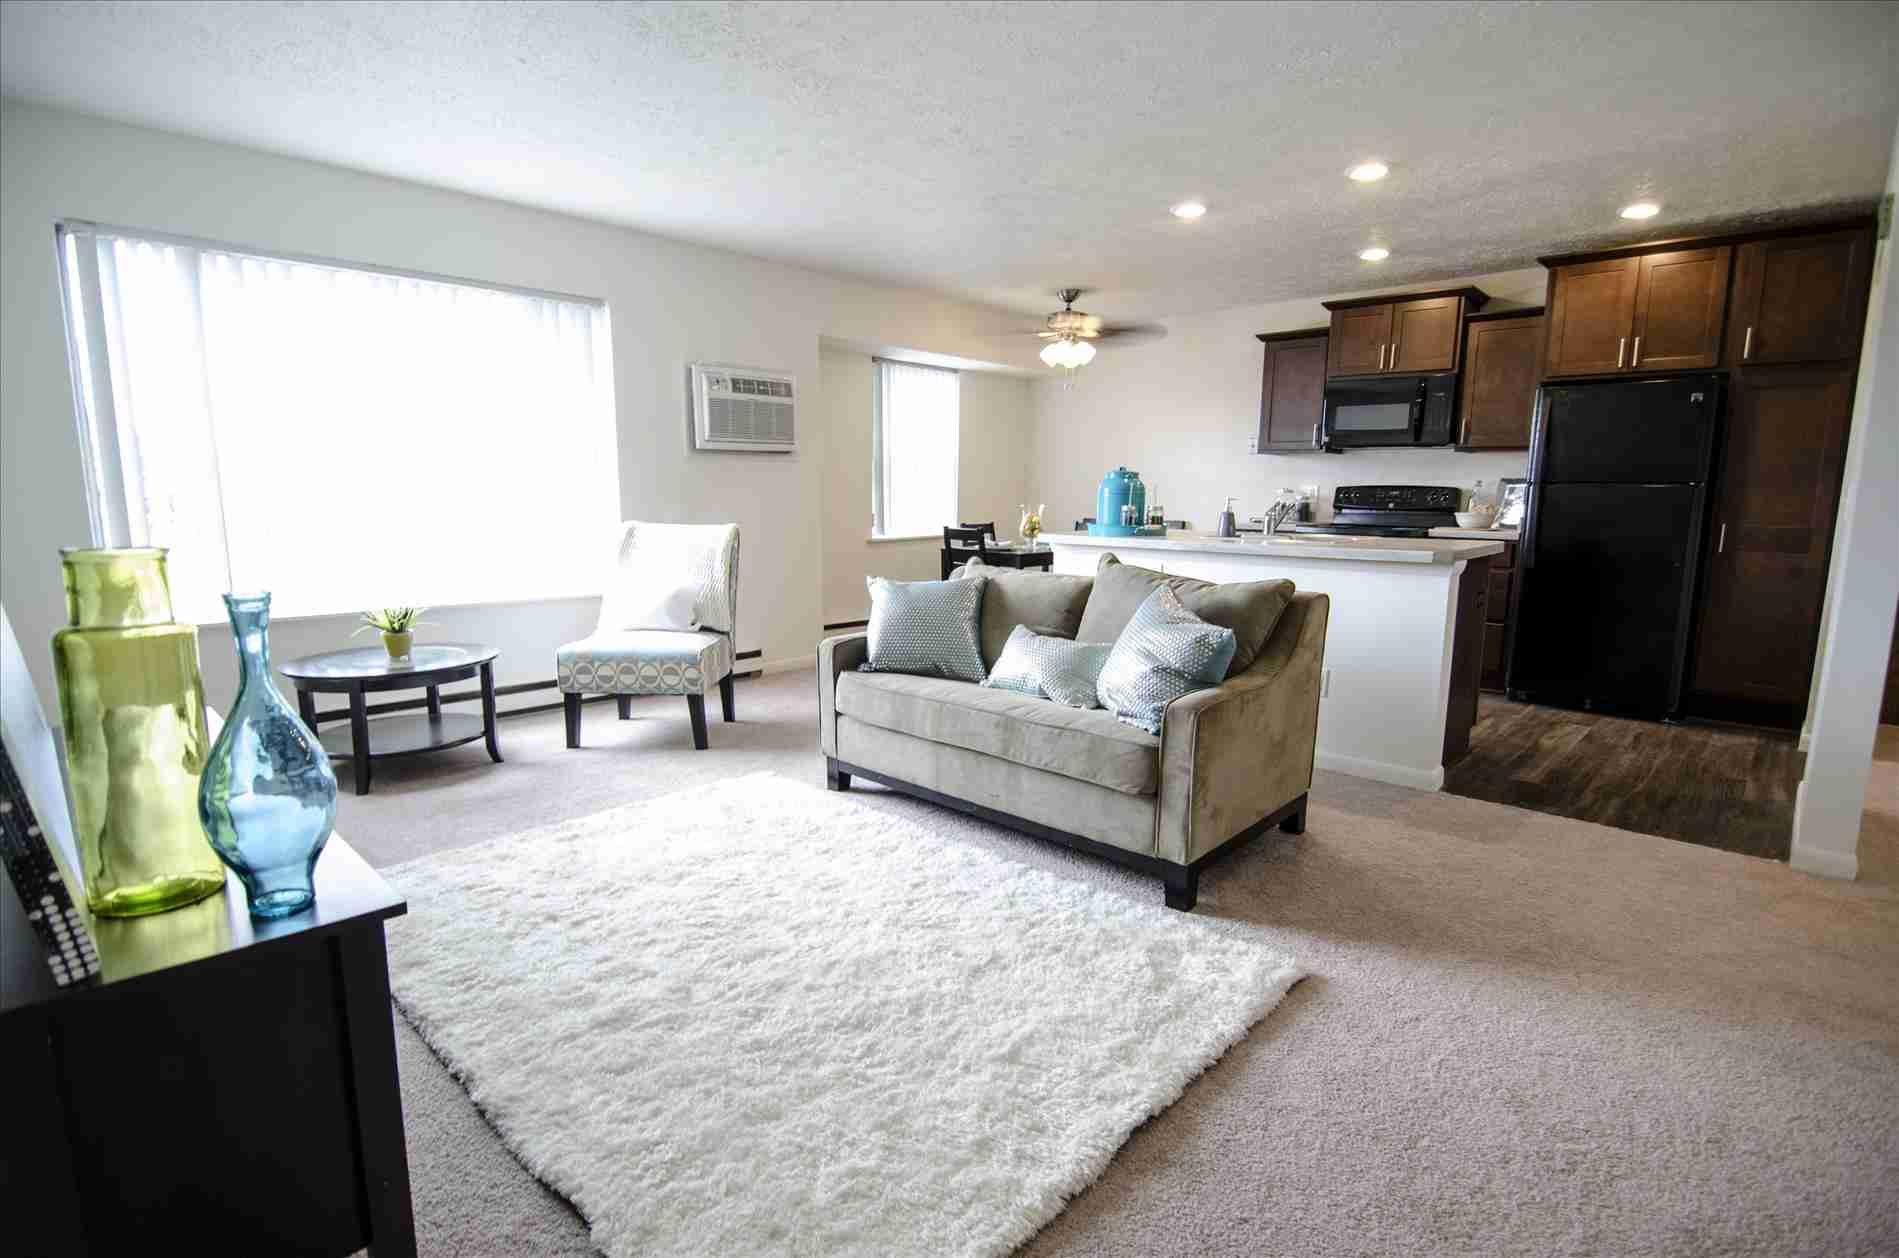 2 bedroom loft  New post Trending bedroom apartments lansing miVisitentermp